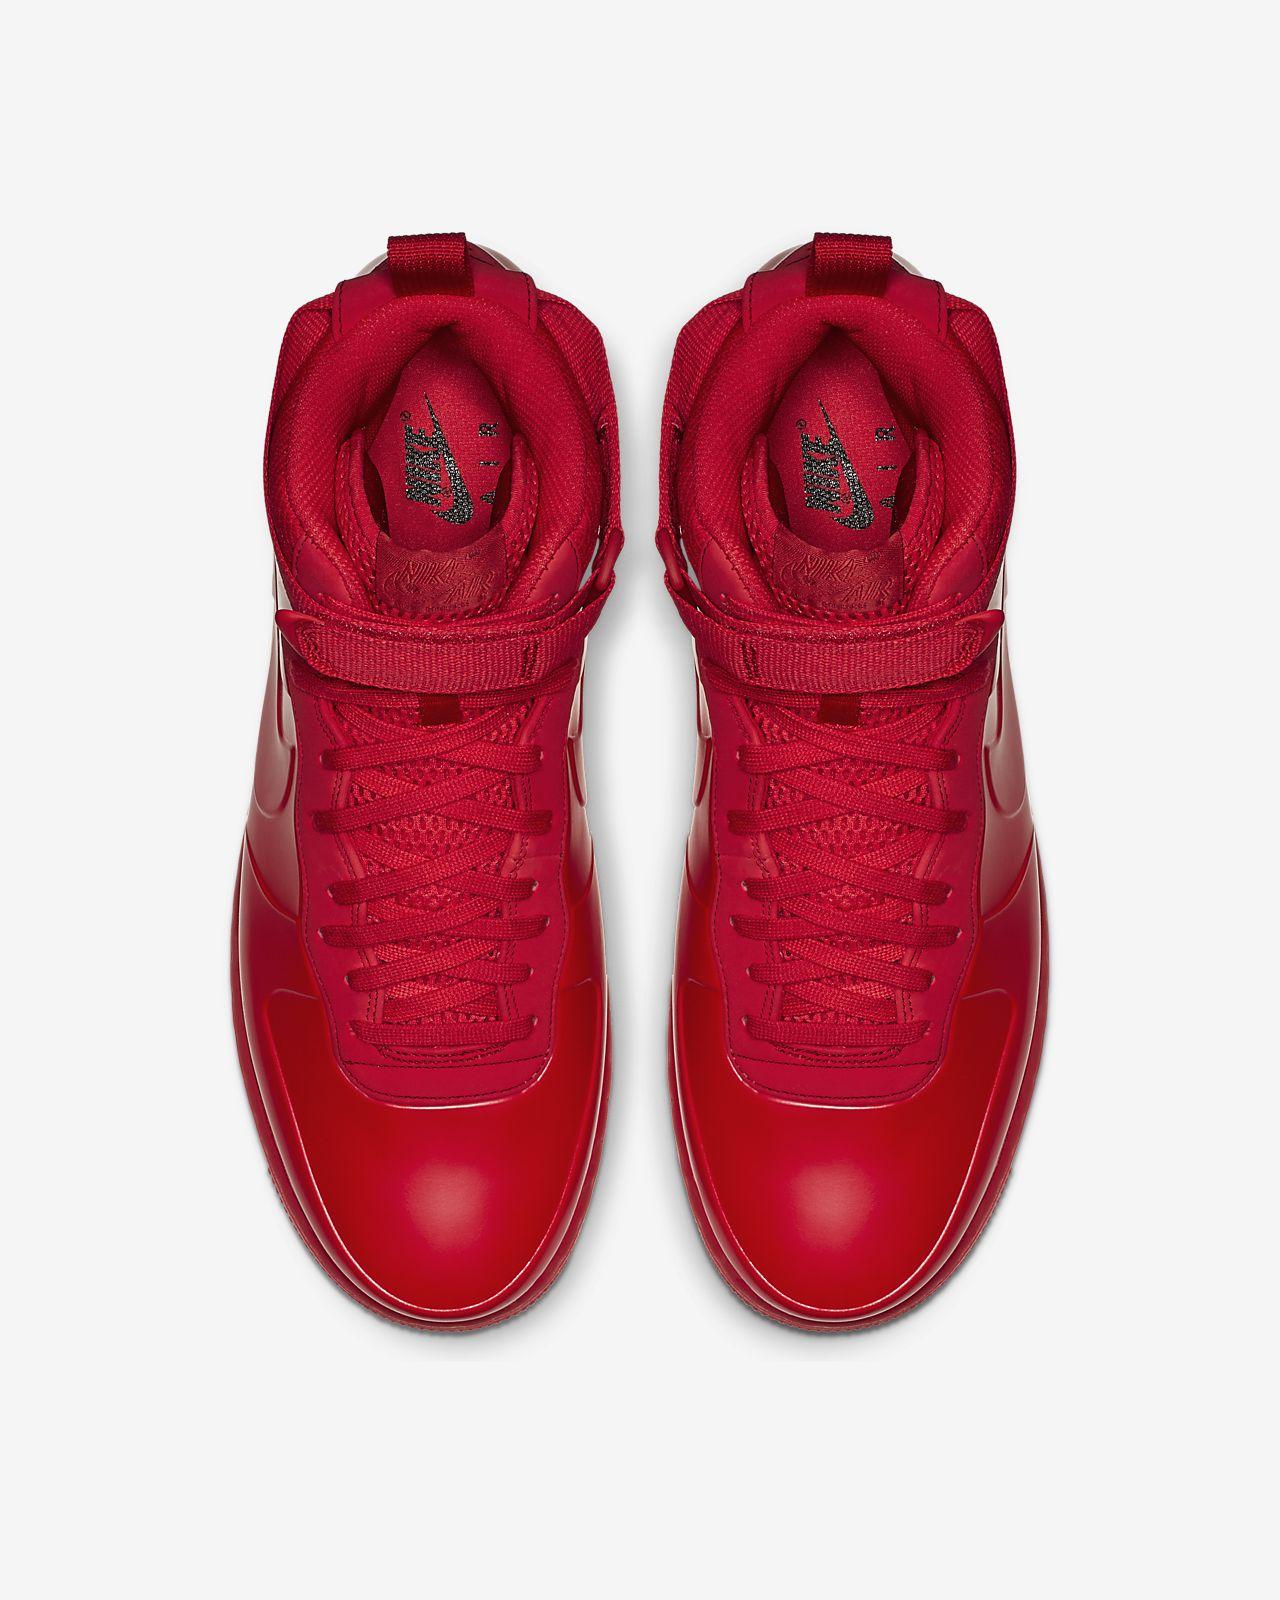 innovative design 29264 82bbd ... Nike Air Force 1 Foamposite Cupsole Men s Shoe